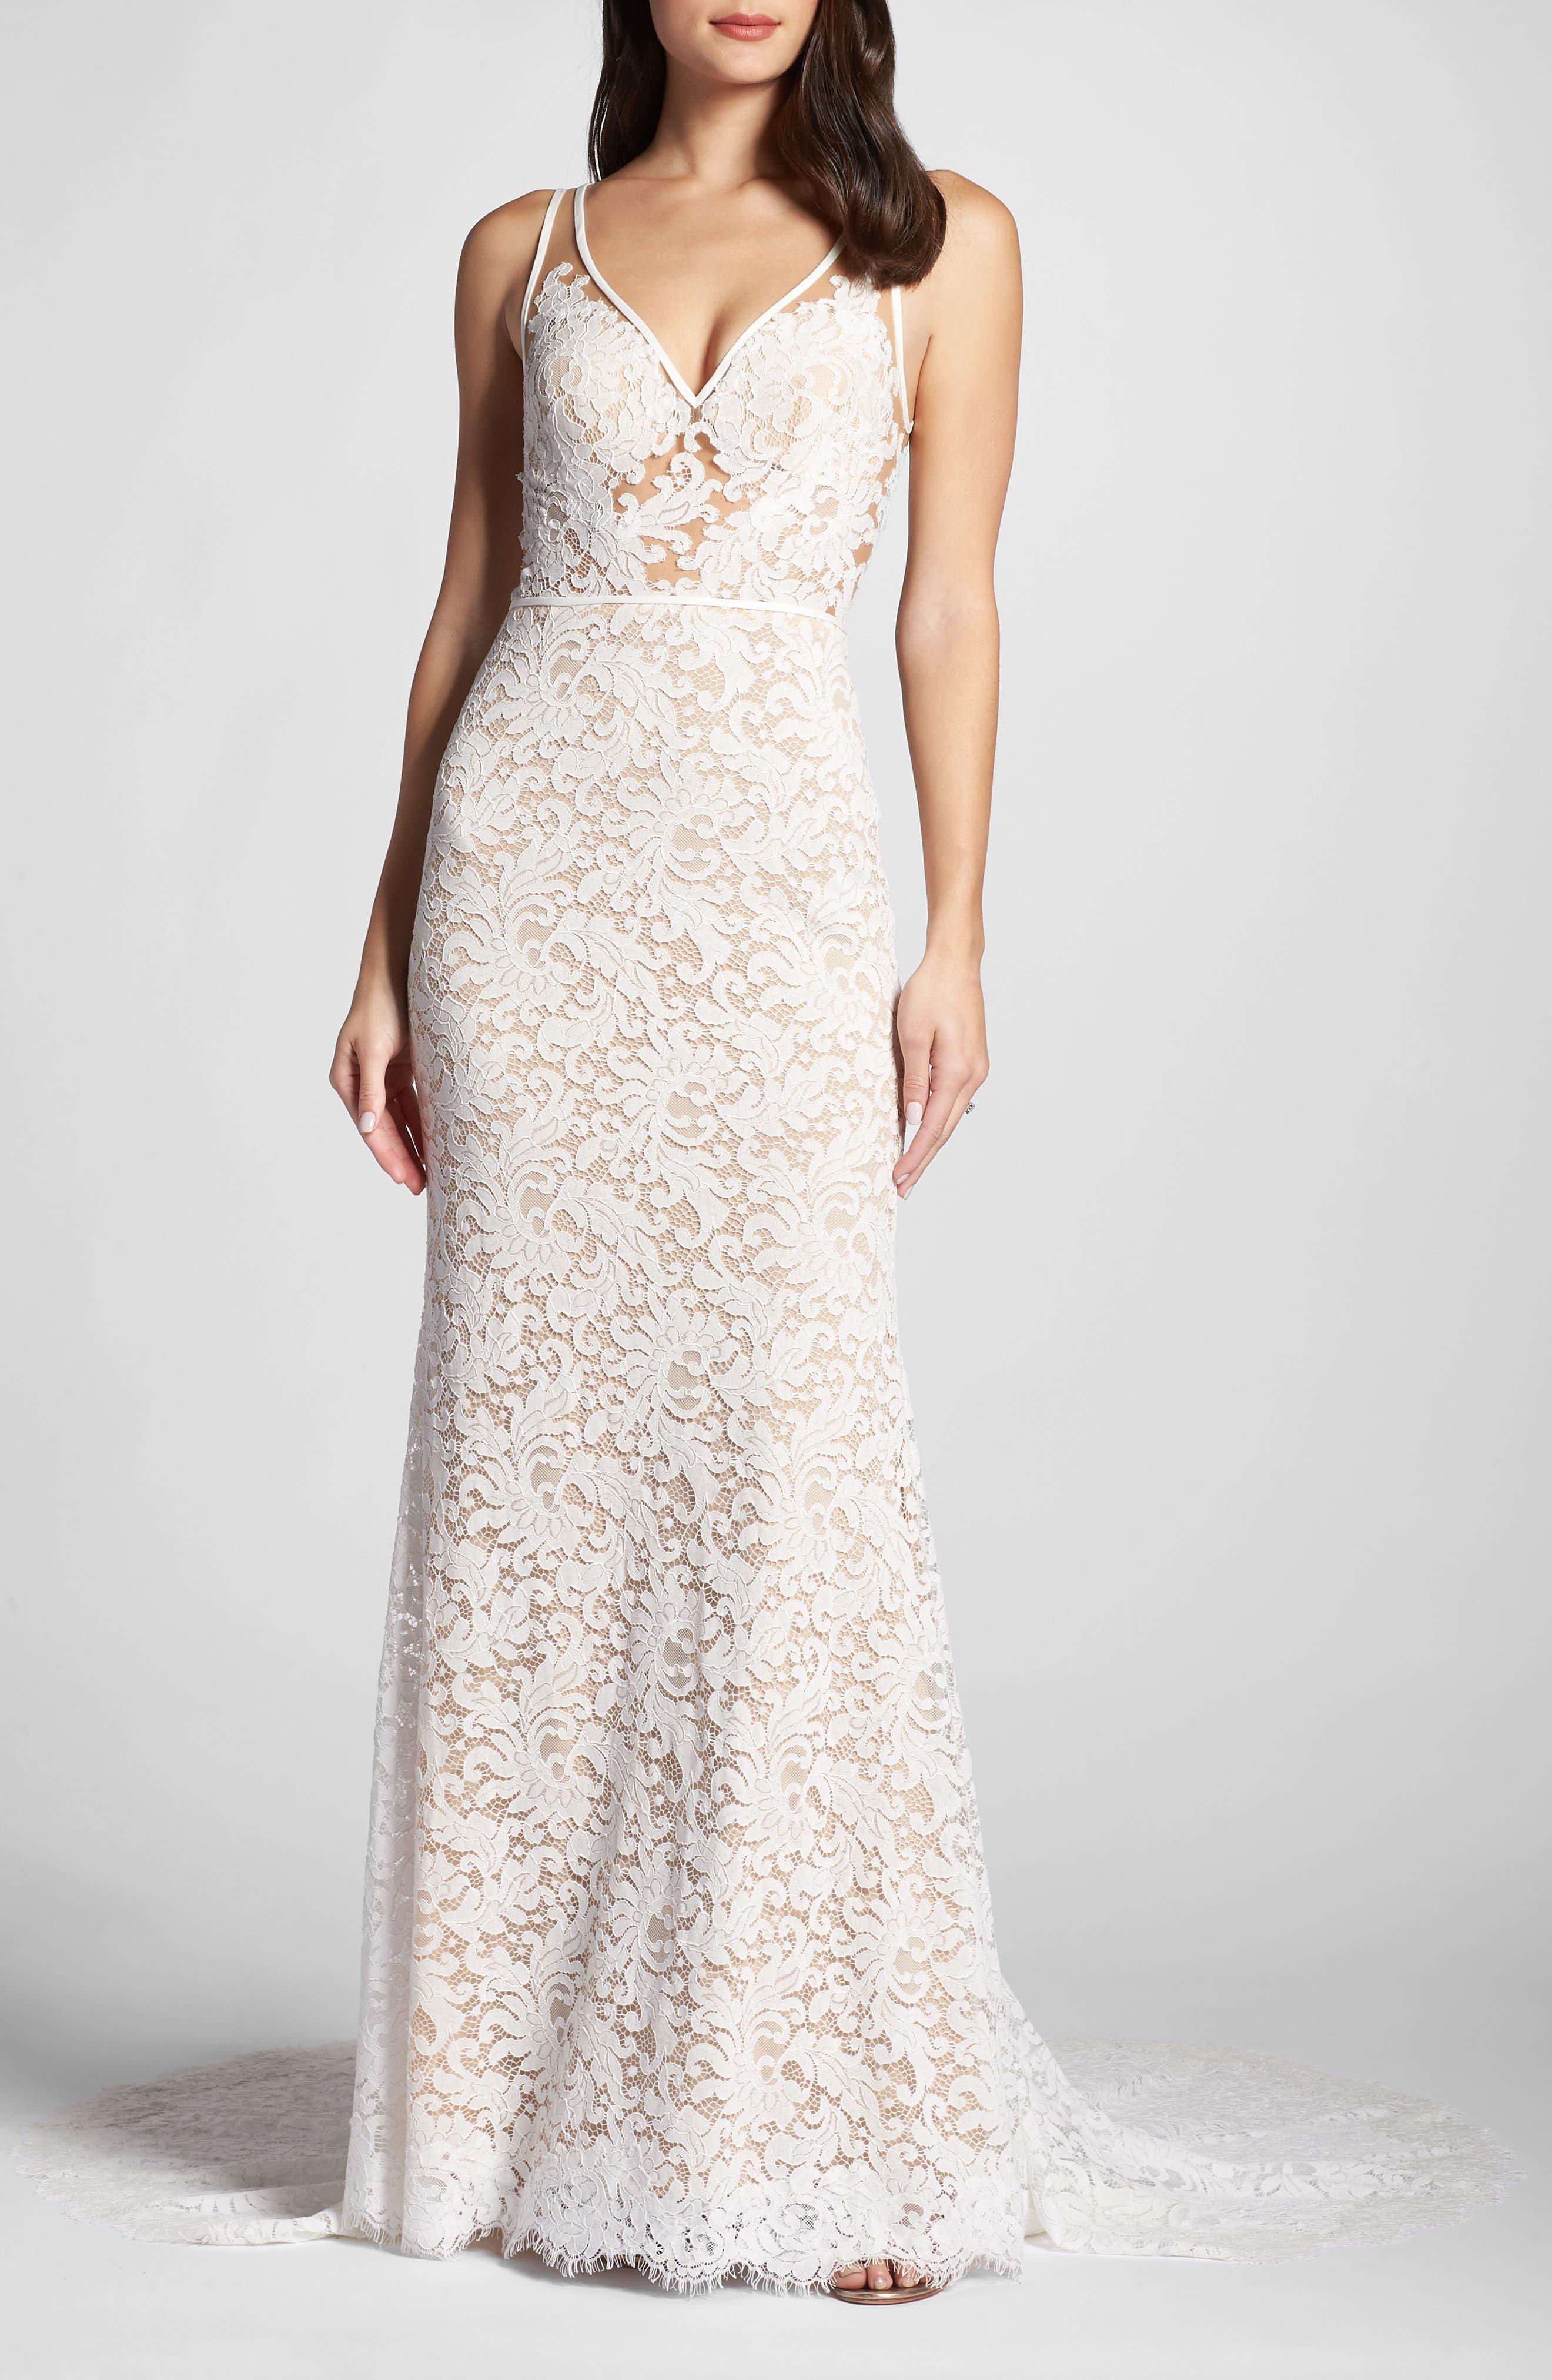 wedding dress for short women